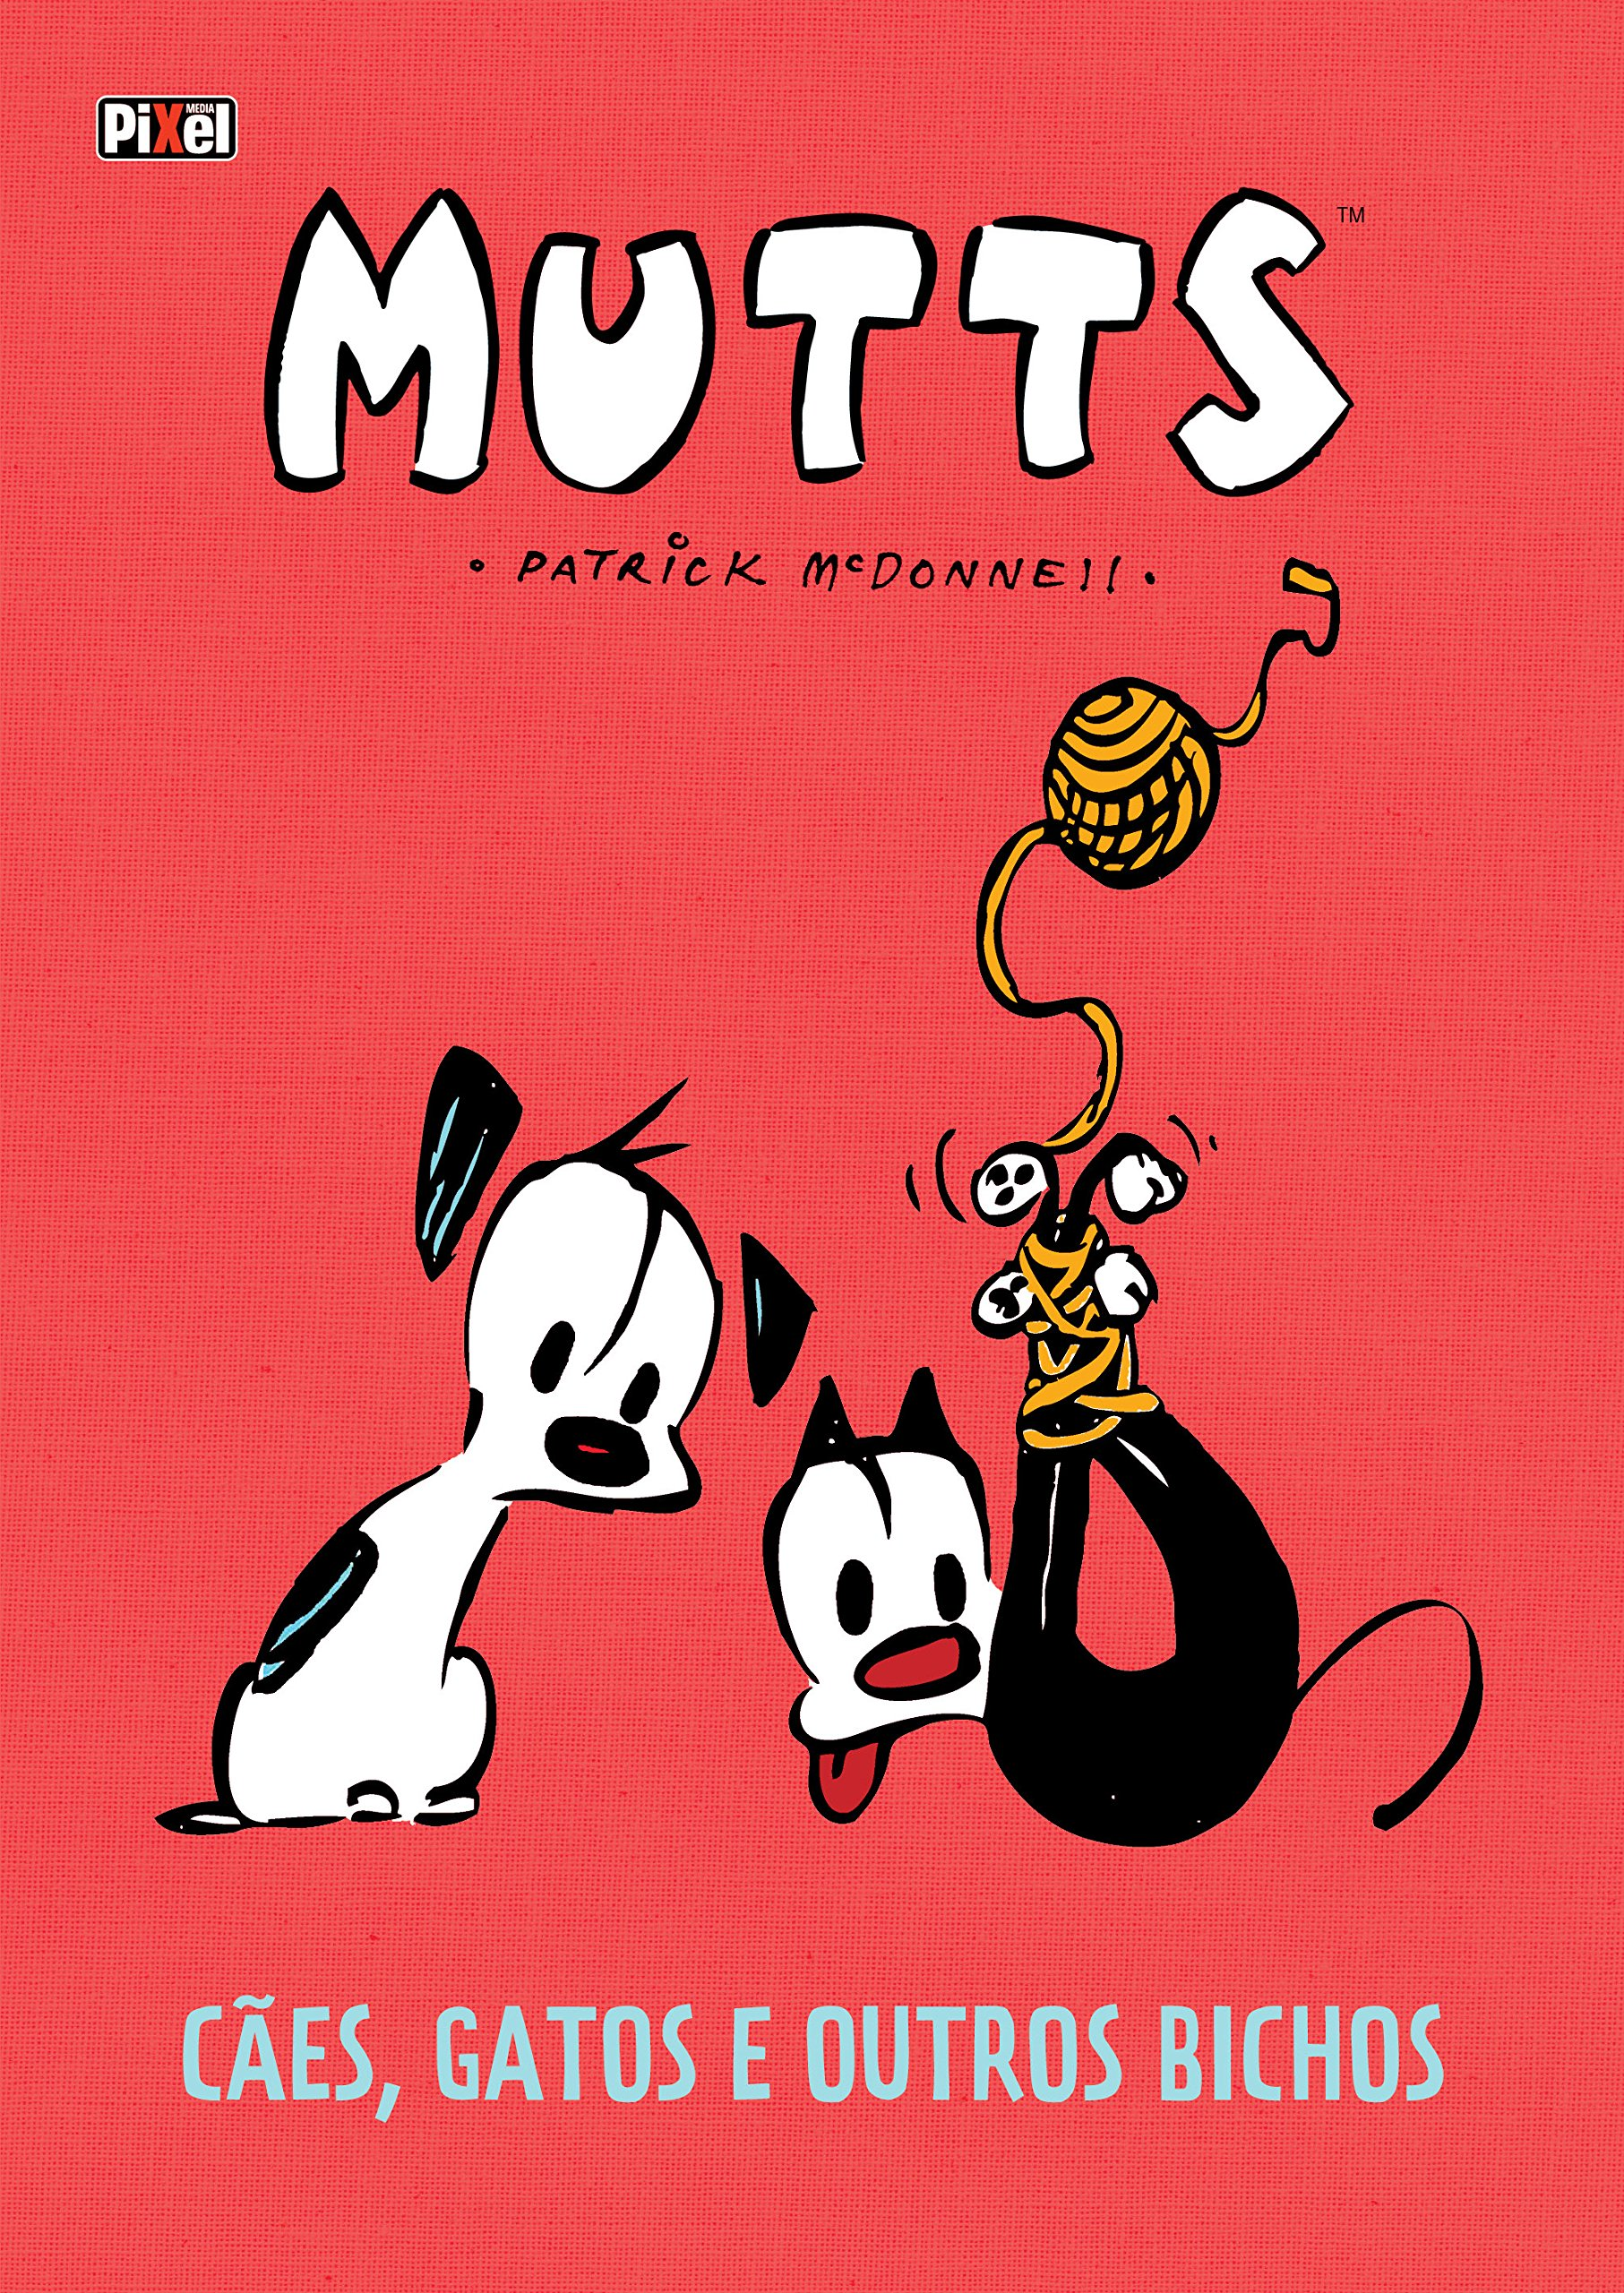 Mutts. Caes, Gatos E Outros Bichos: Patrick Mcdonnell: 9788577487660: Amazon.com: Books